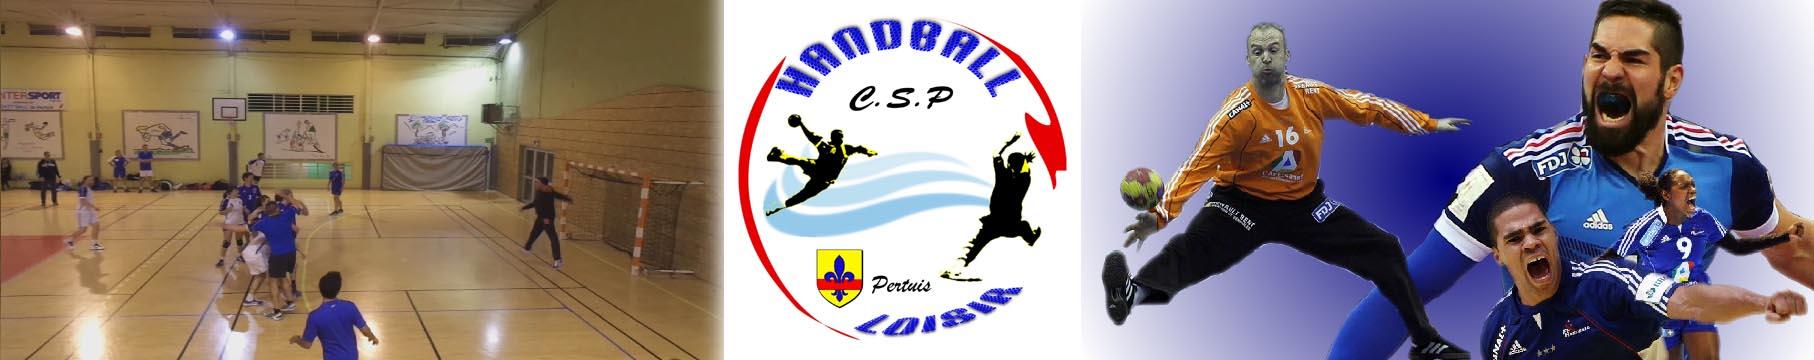 Handball Loisir Pertuis